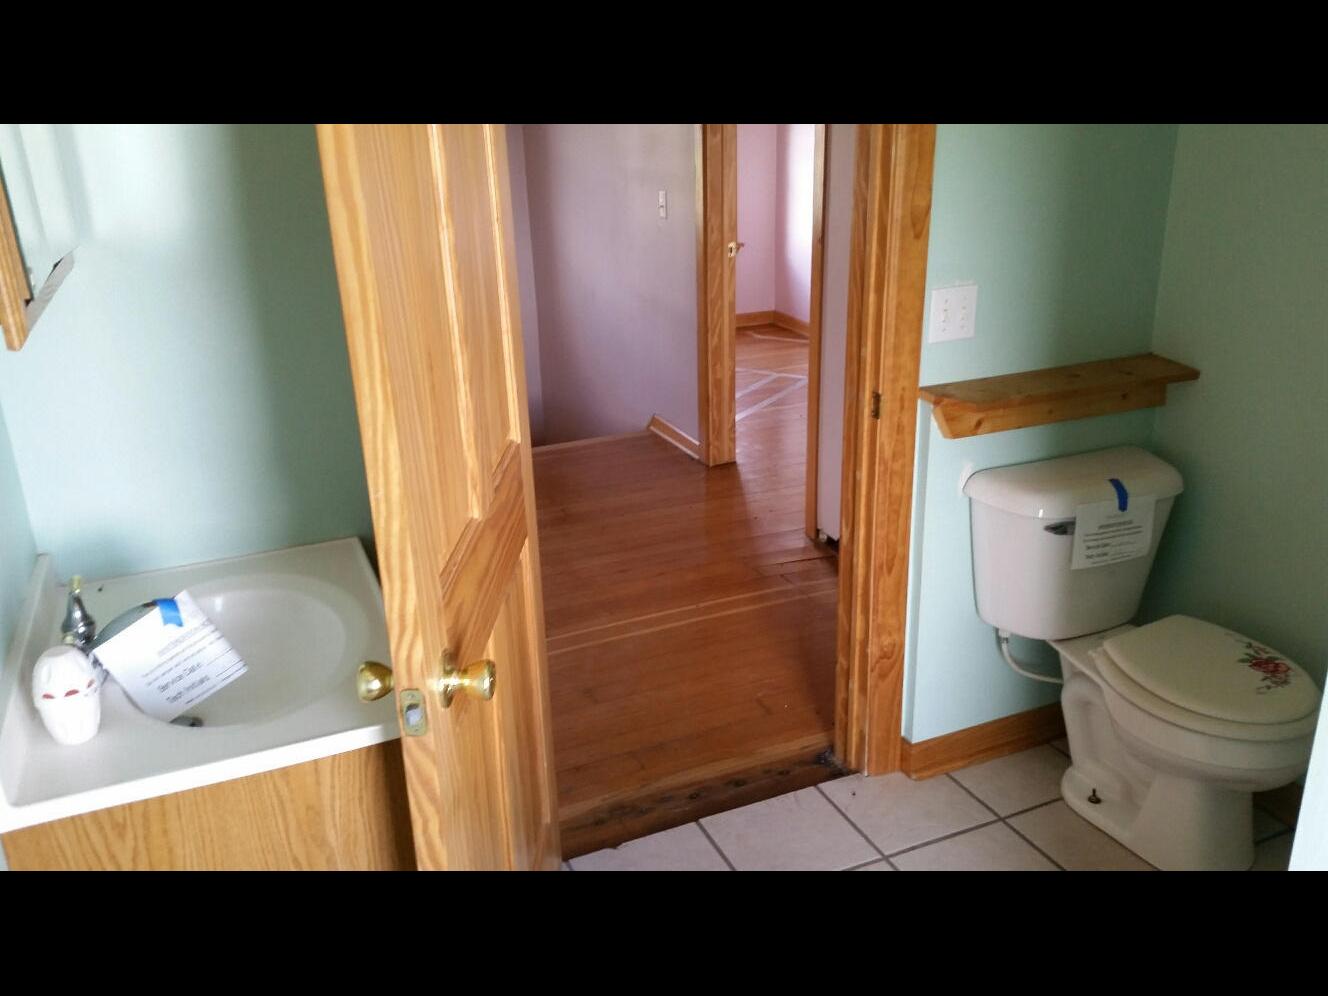 Hannon upper bathroom